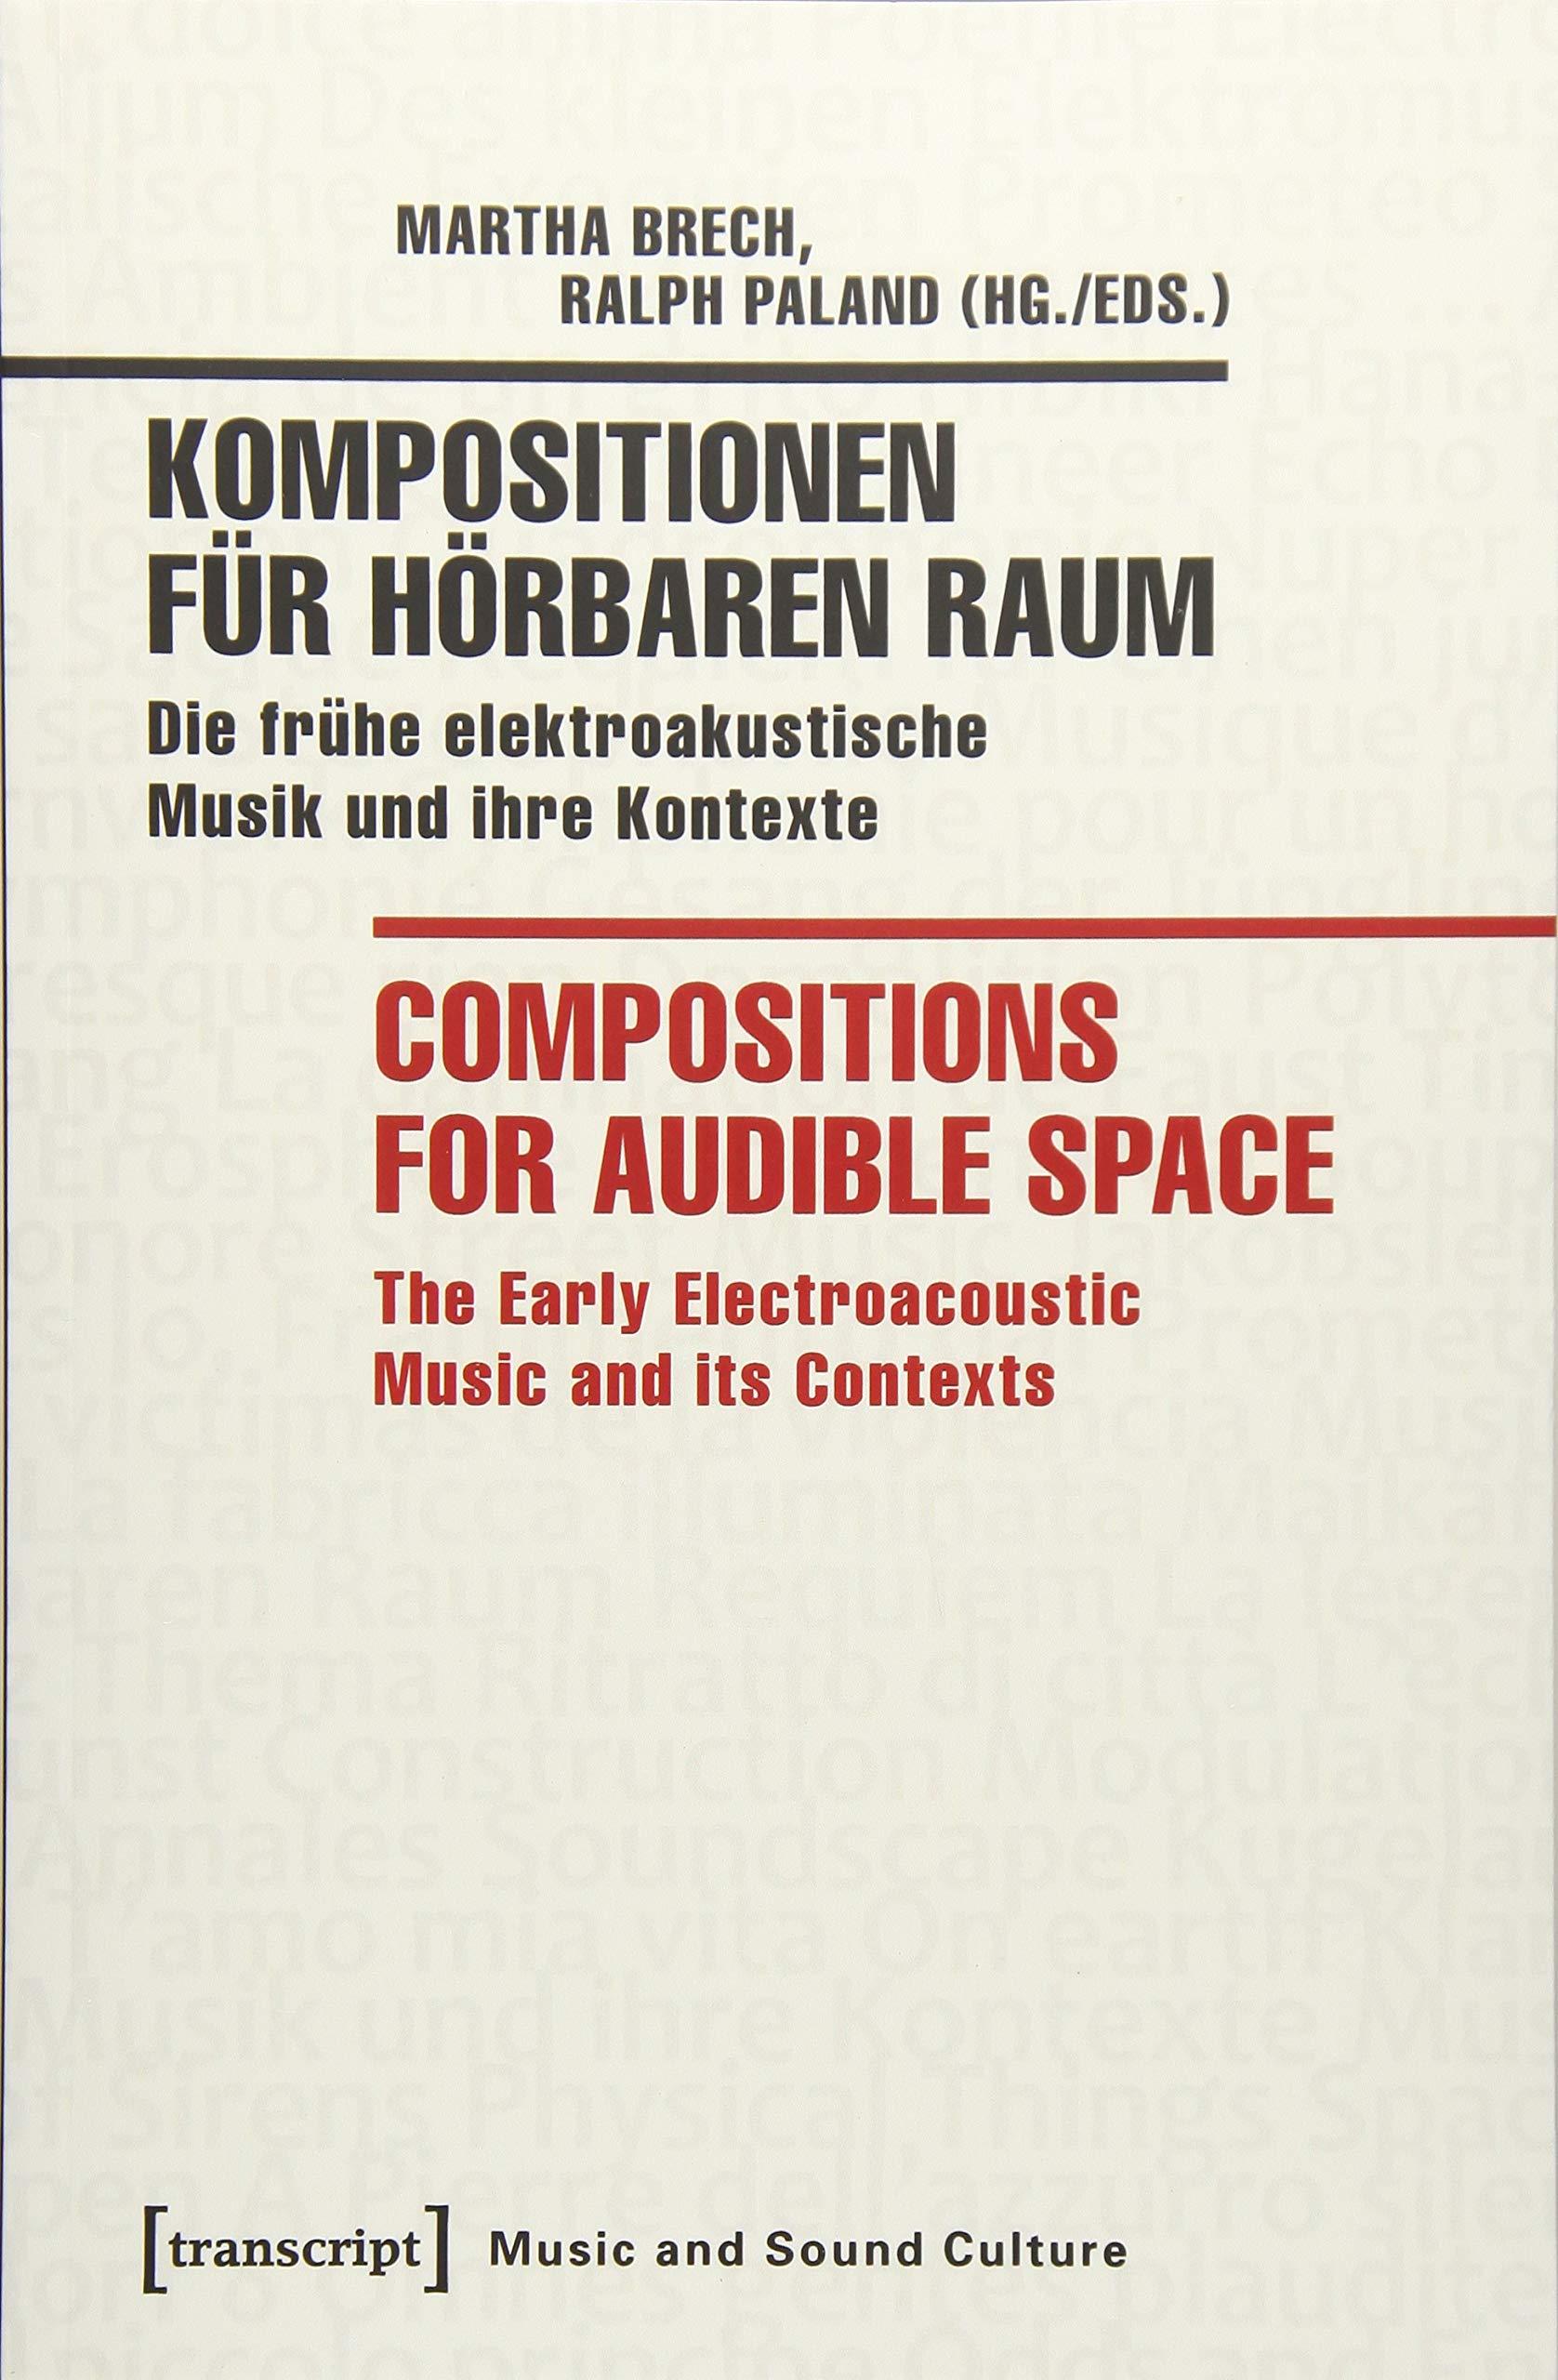 Kompositionen für hörbaren Raum / Compositions for Audible Space: Die frühe elektroakustische Musik und ihre Kontexte / The Early Electroacoustic Music and its Contexts (Musik und Klangkultur)